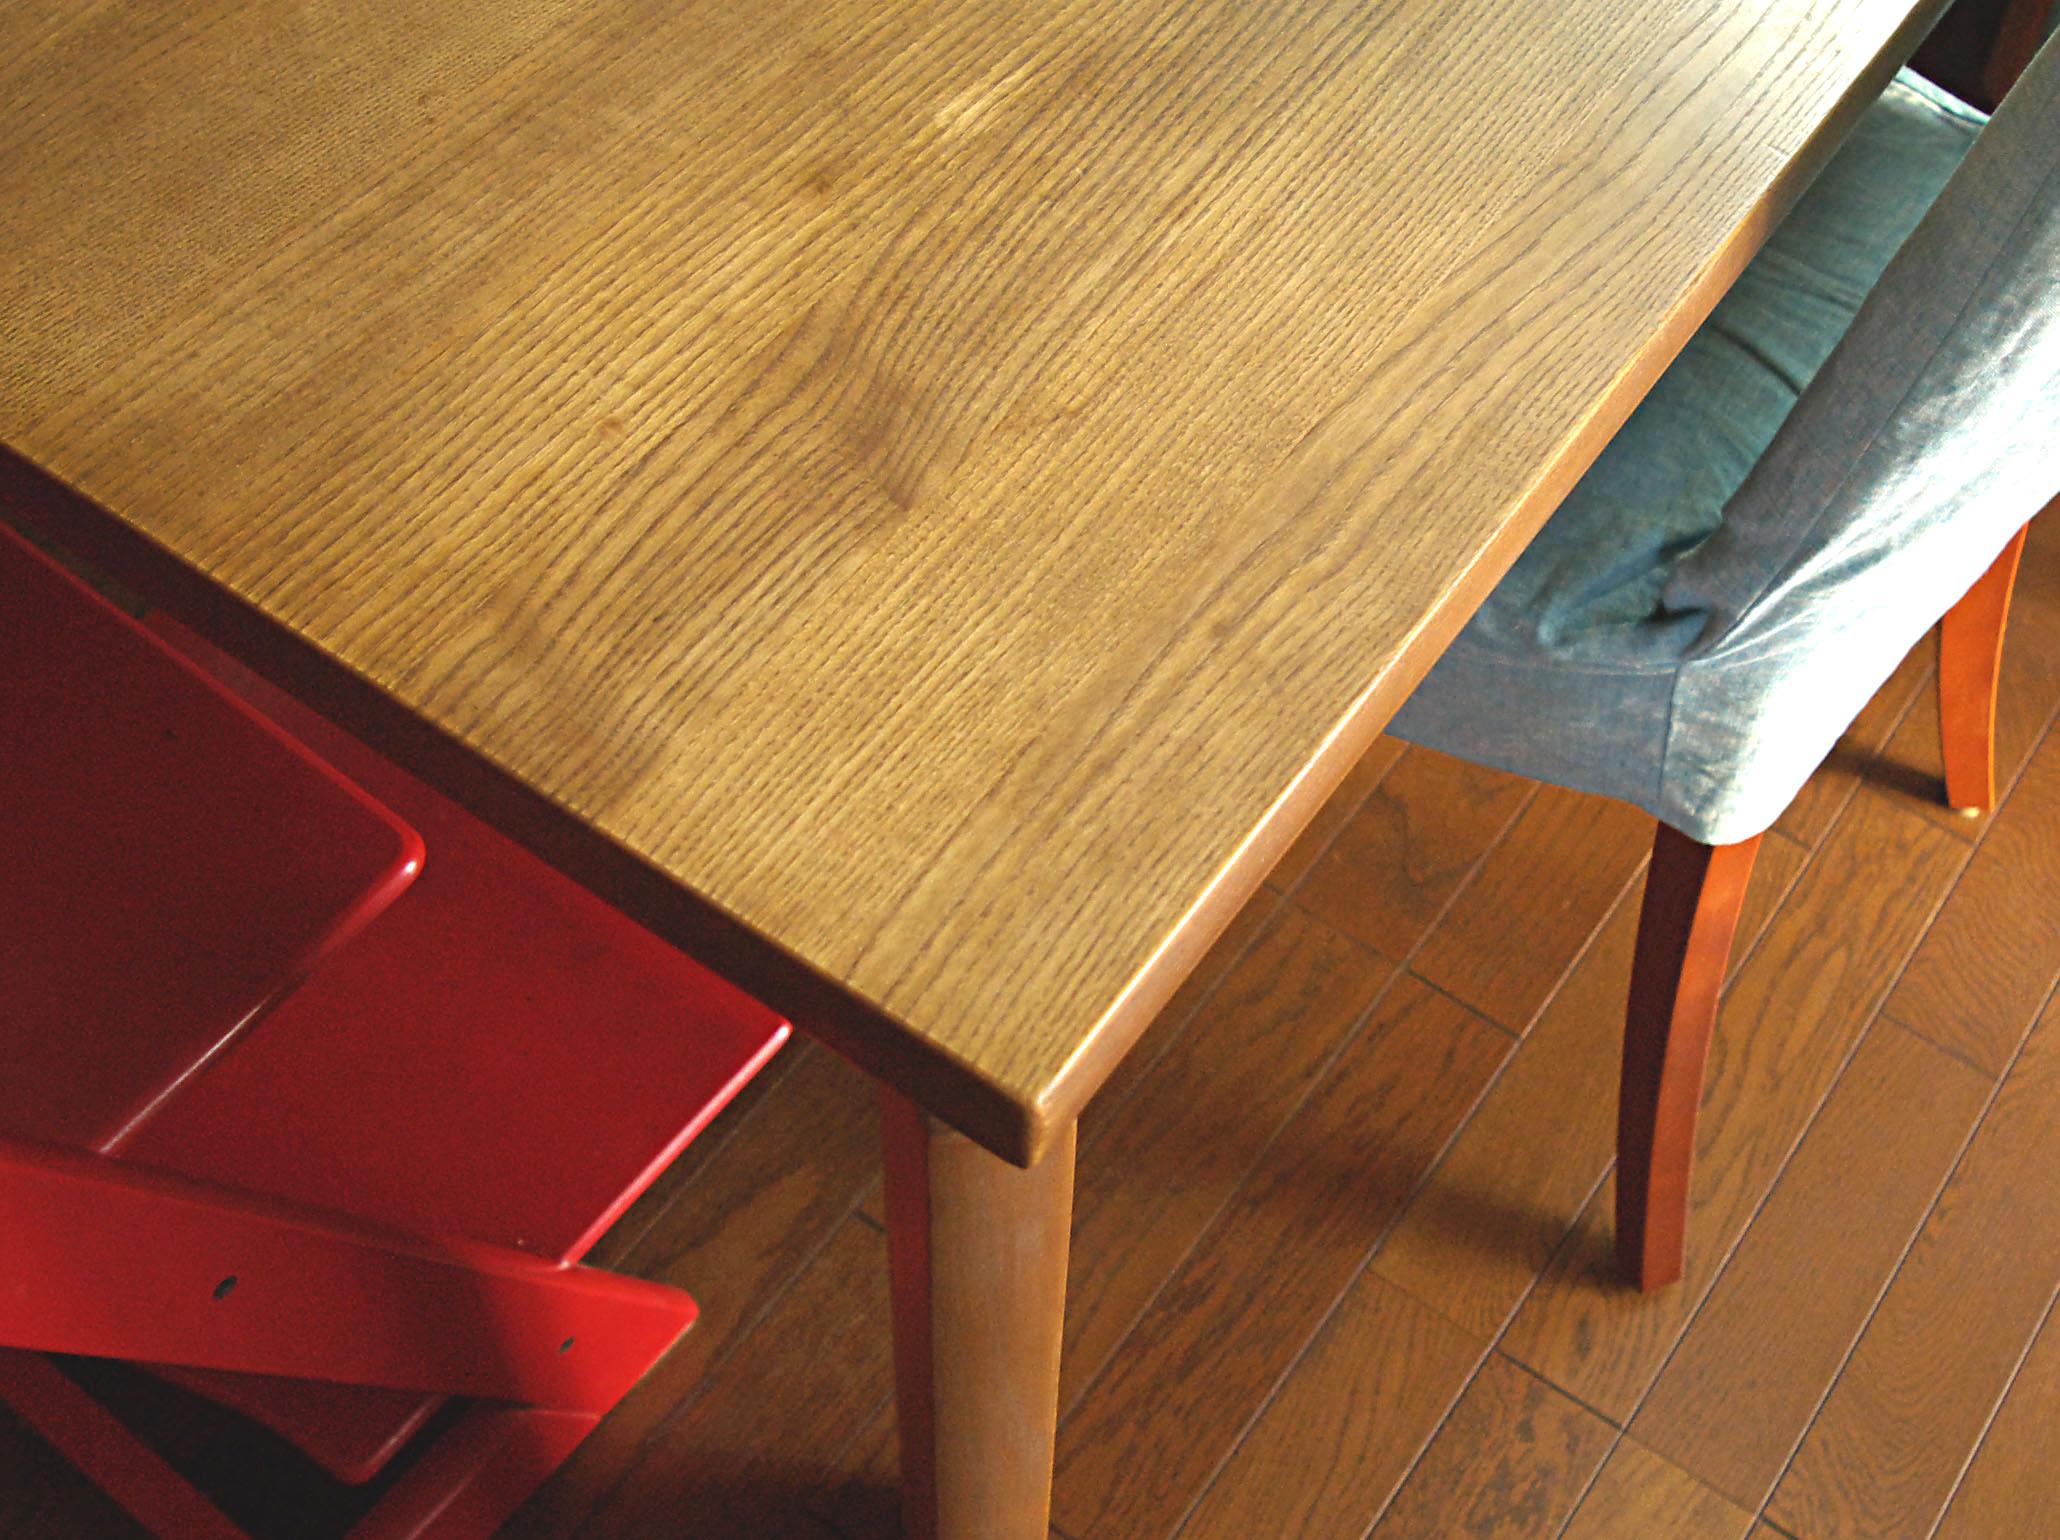 http://www.karimoku.co.jp/blog/kidsinterior/Table.jpg